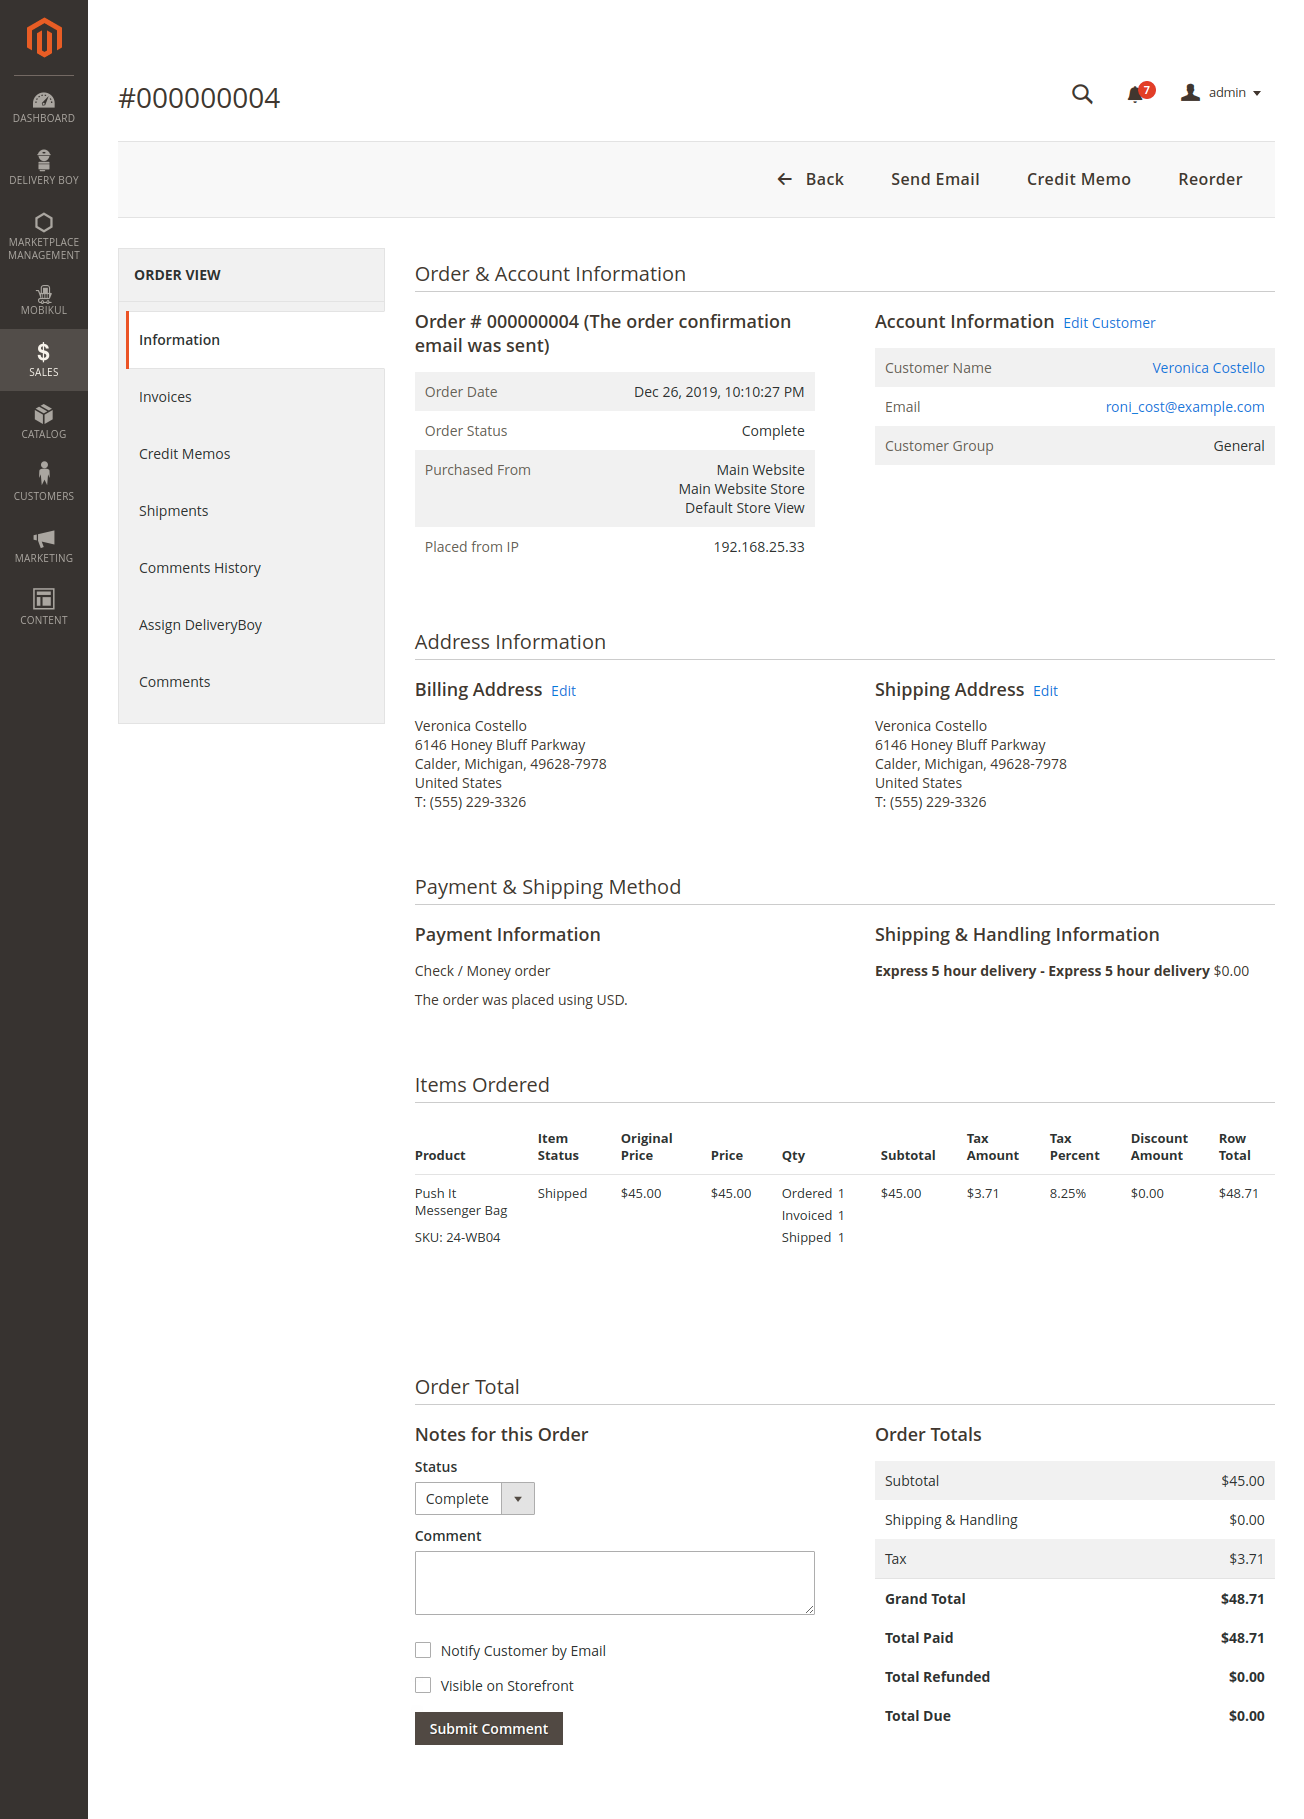 webkul-magento2-mobikul-delivery-boy-app-view-order-details